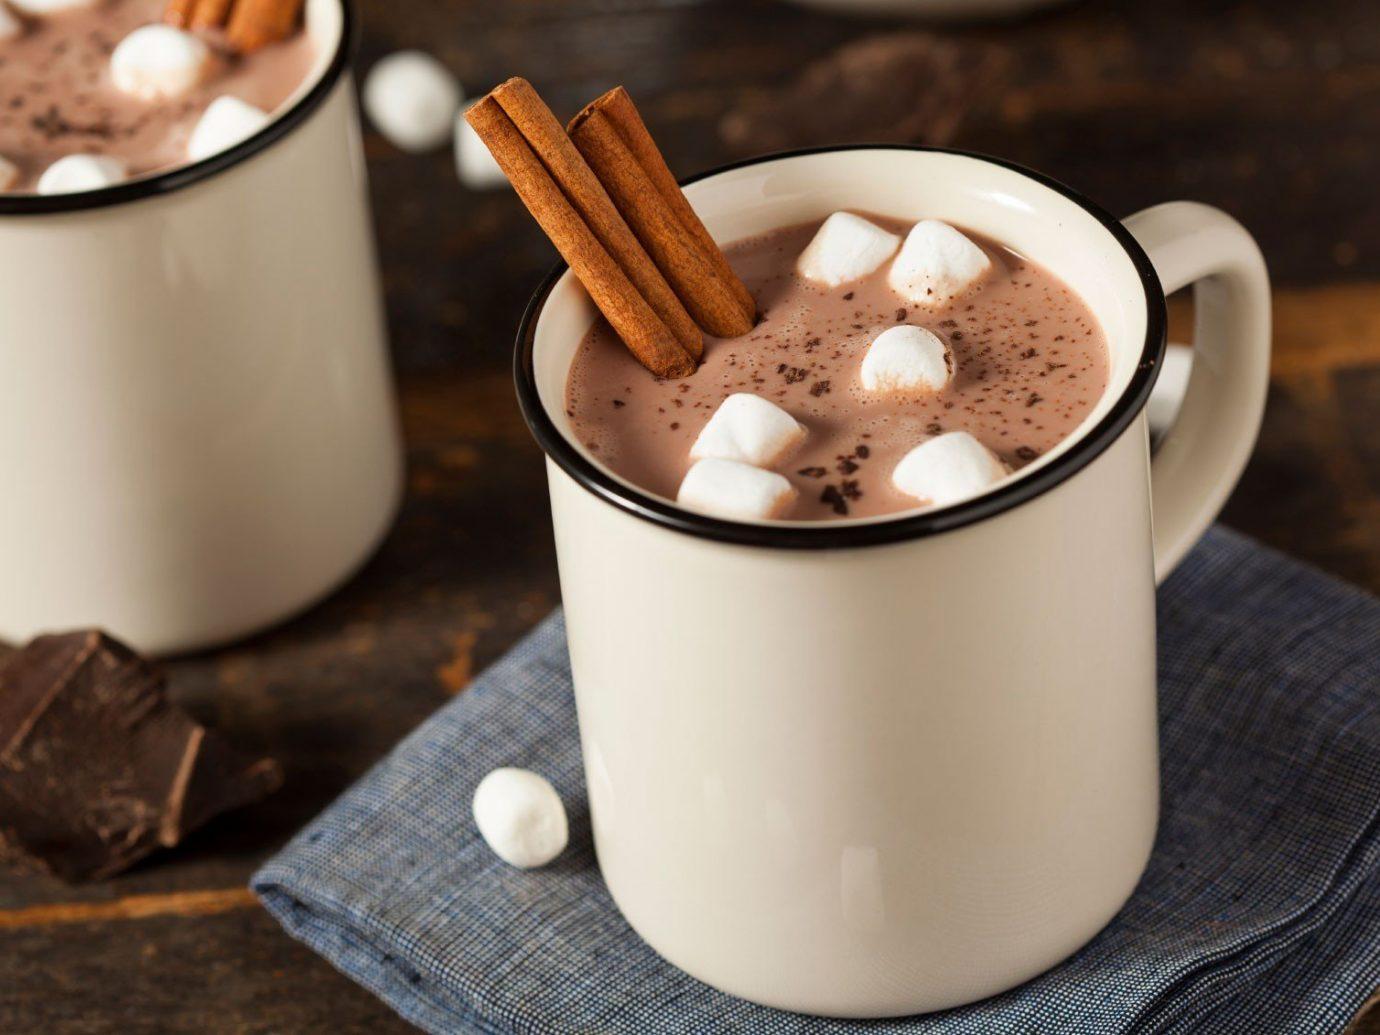 Food + Drink cup coffee table indoor food dessert milkshake Drink breakfast hot chocolate dairy product flavor chocolate meal coconut produce